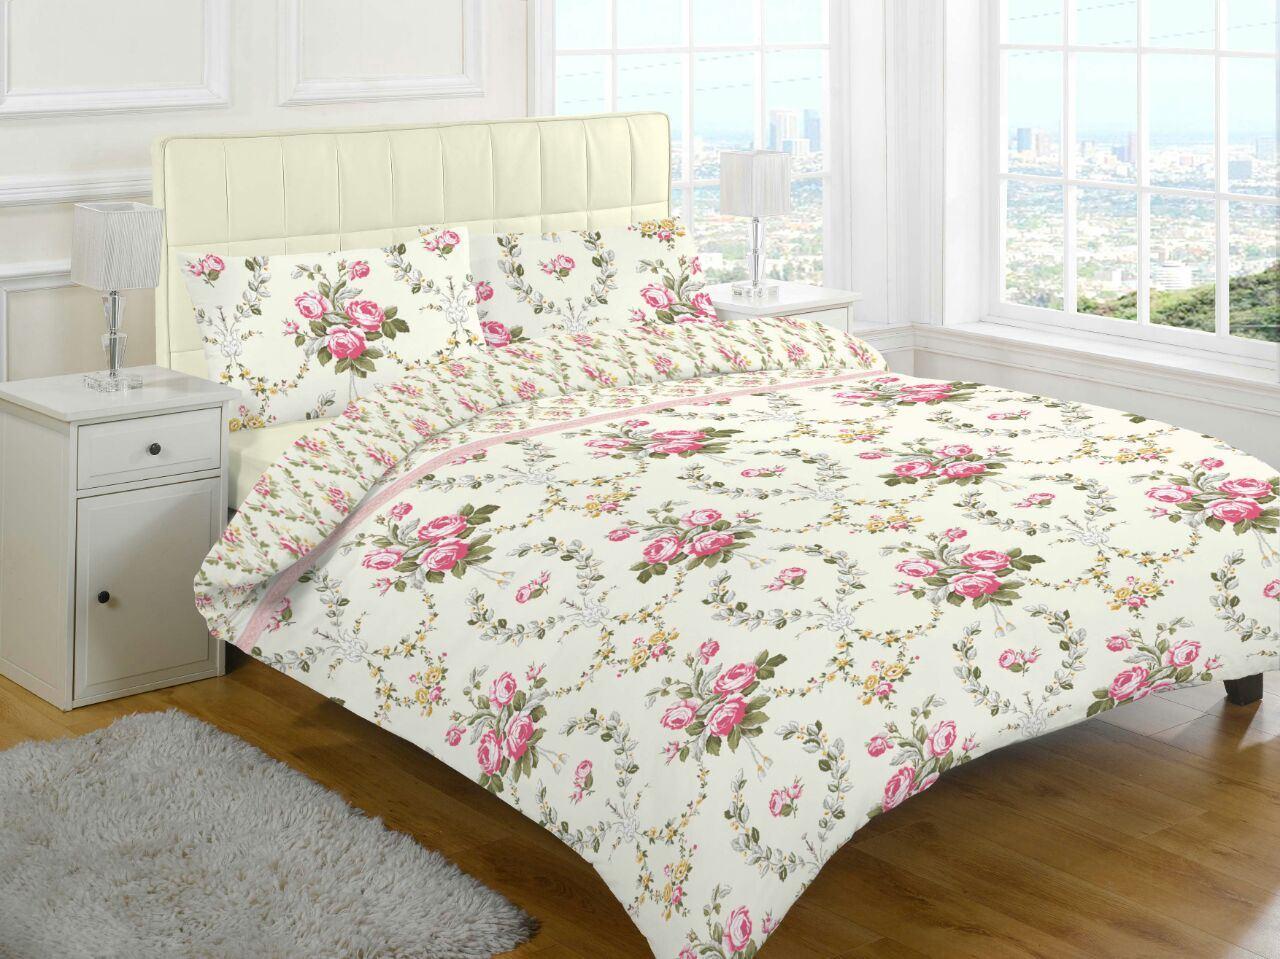 Flannelette Duvet Cover 100 Cotton Brushed Quilt Bedding